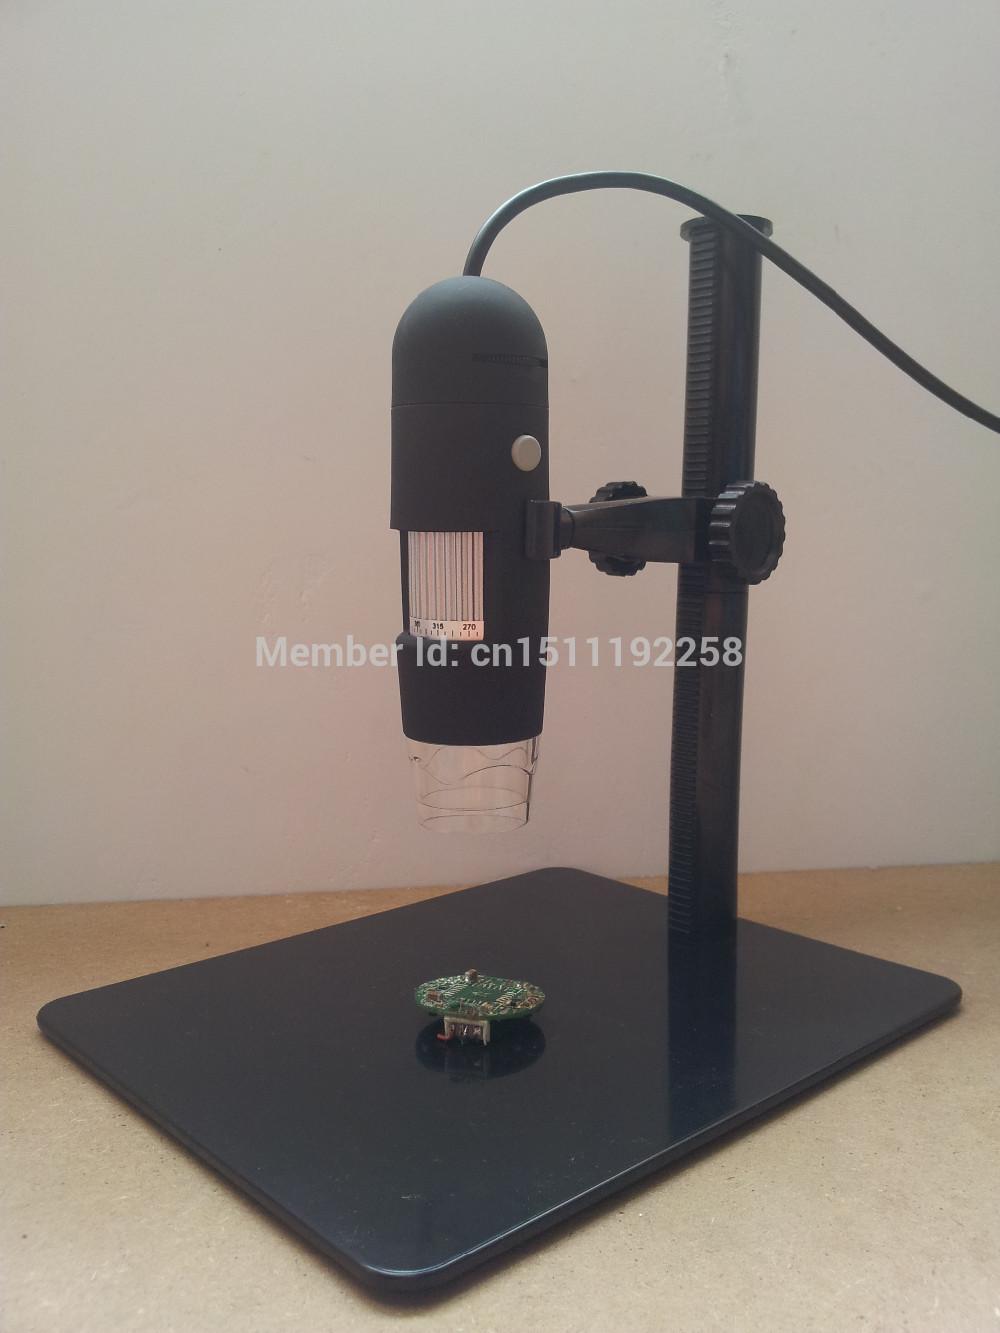 5x-500x hd 디지털 av tv 비디오 현미경 내시경 카메라 세트 w 8 led 조명 illuminator 및 높이 조절 스탠드 5tvd